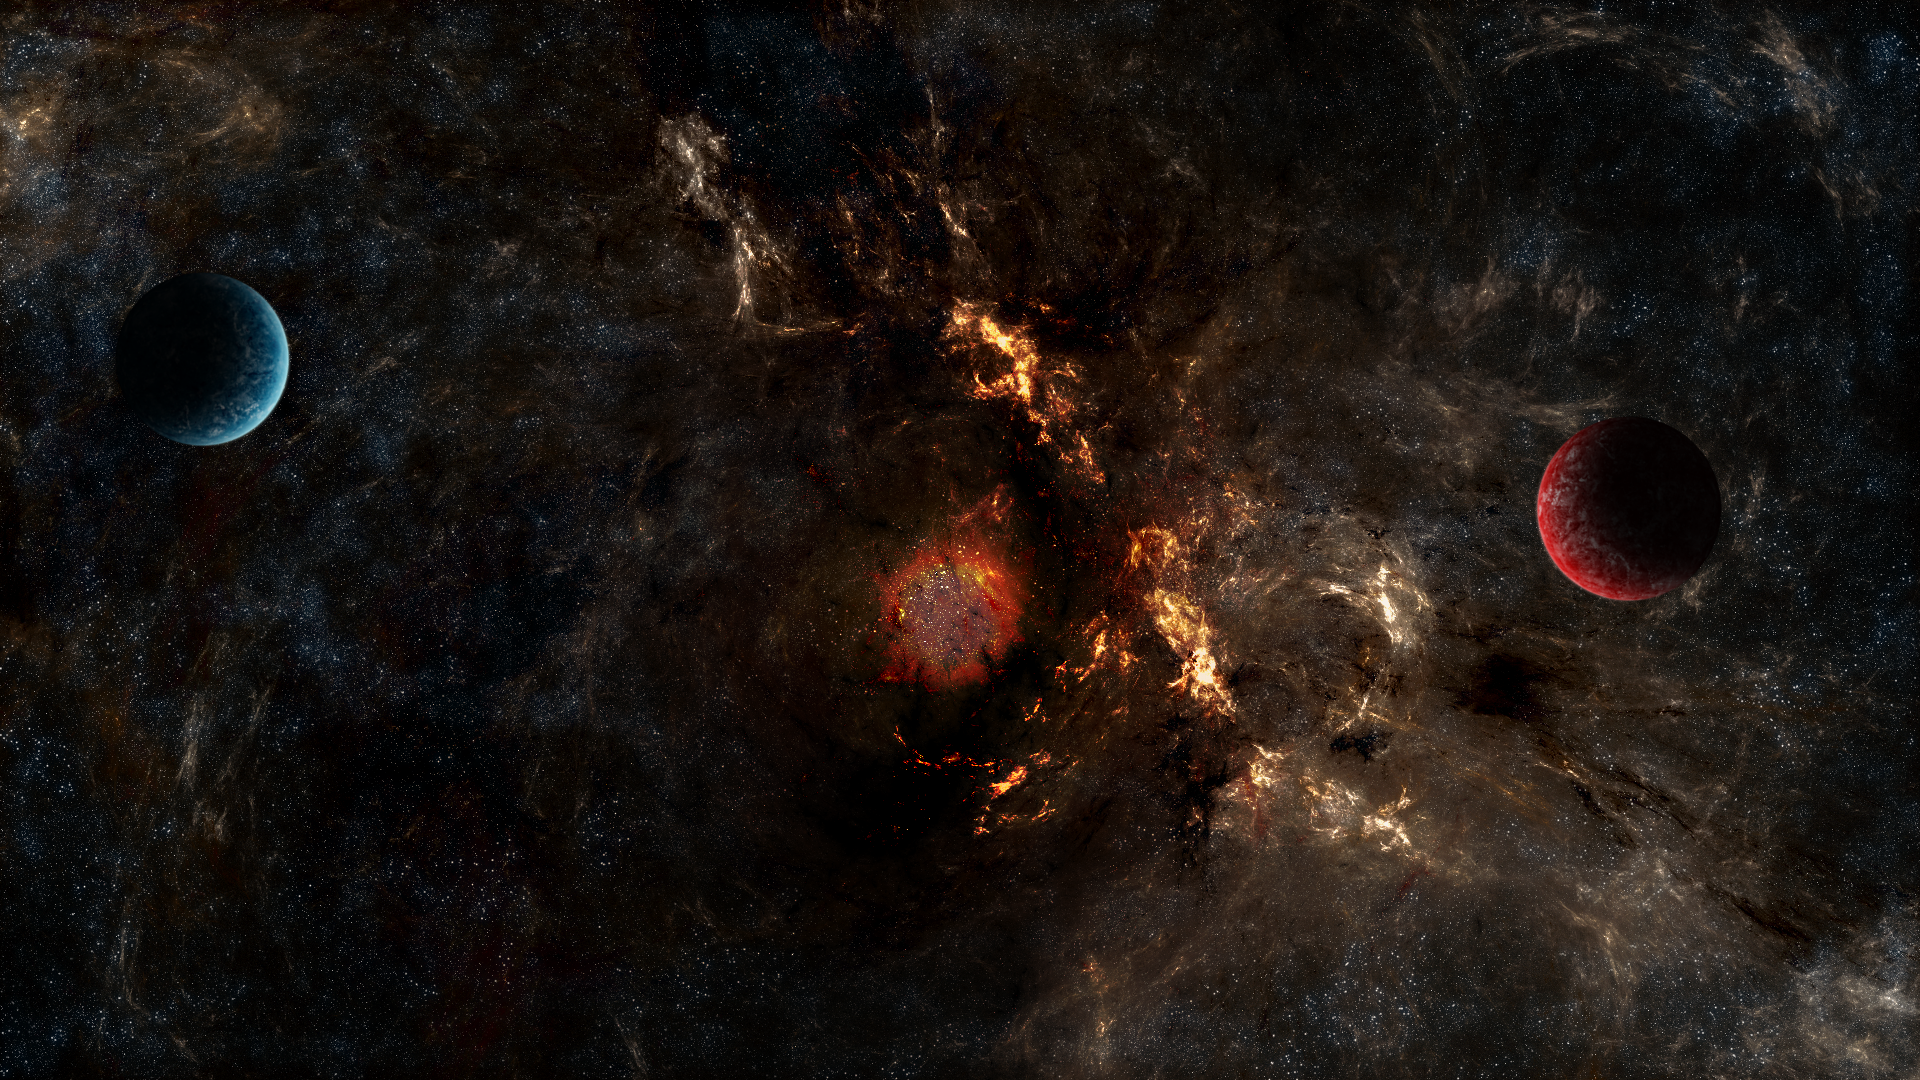 Supernova - 1920x1080 by abluescarab